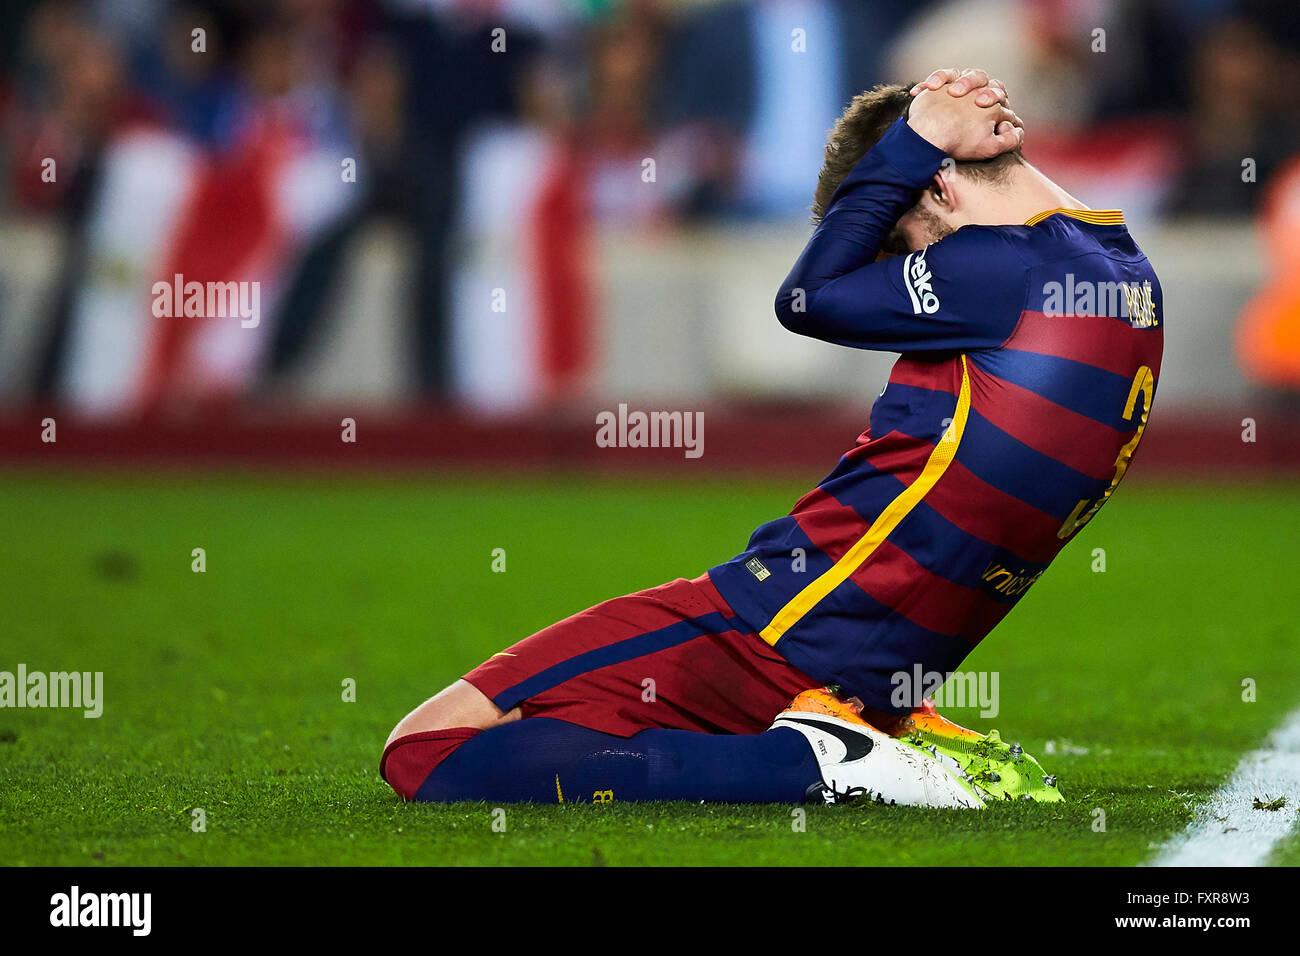 Gerard Pique (FC Barcelona), during La Liga soccer match between FC Barcelona and Valencia CF, at the Camp Nou stadium - Stock Image